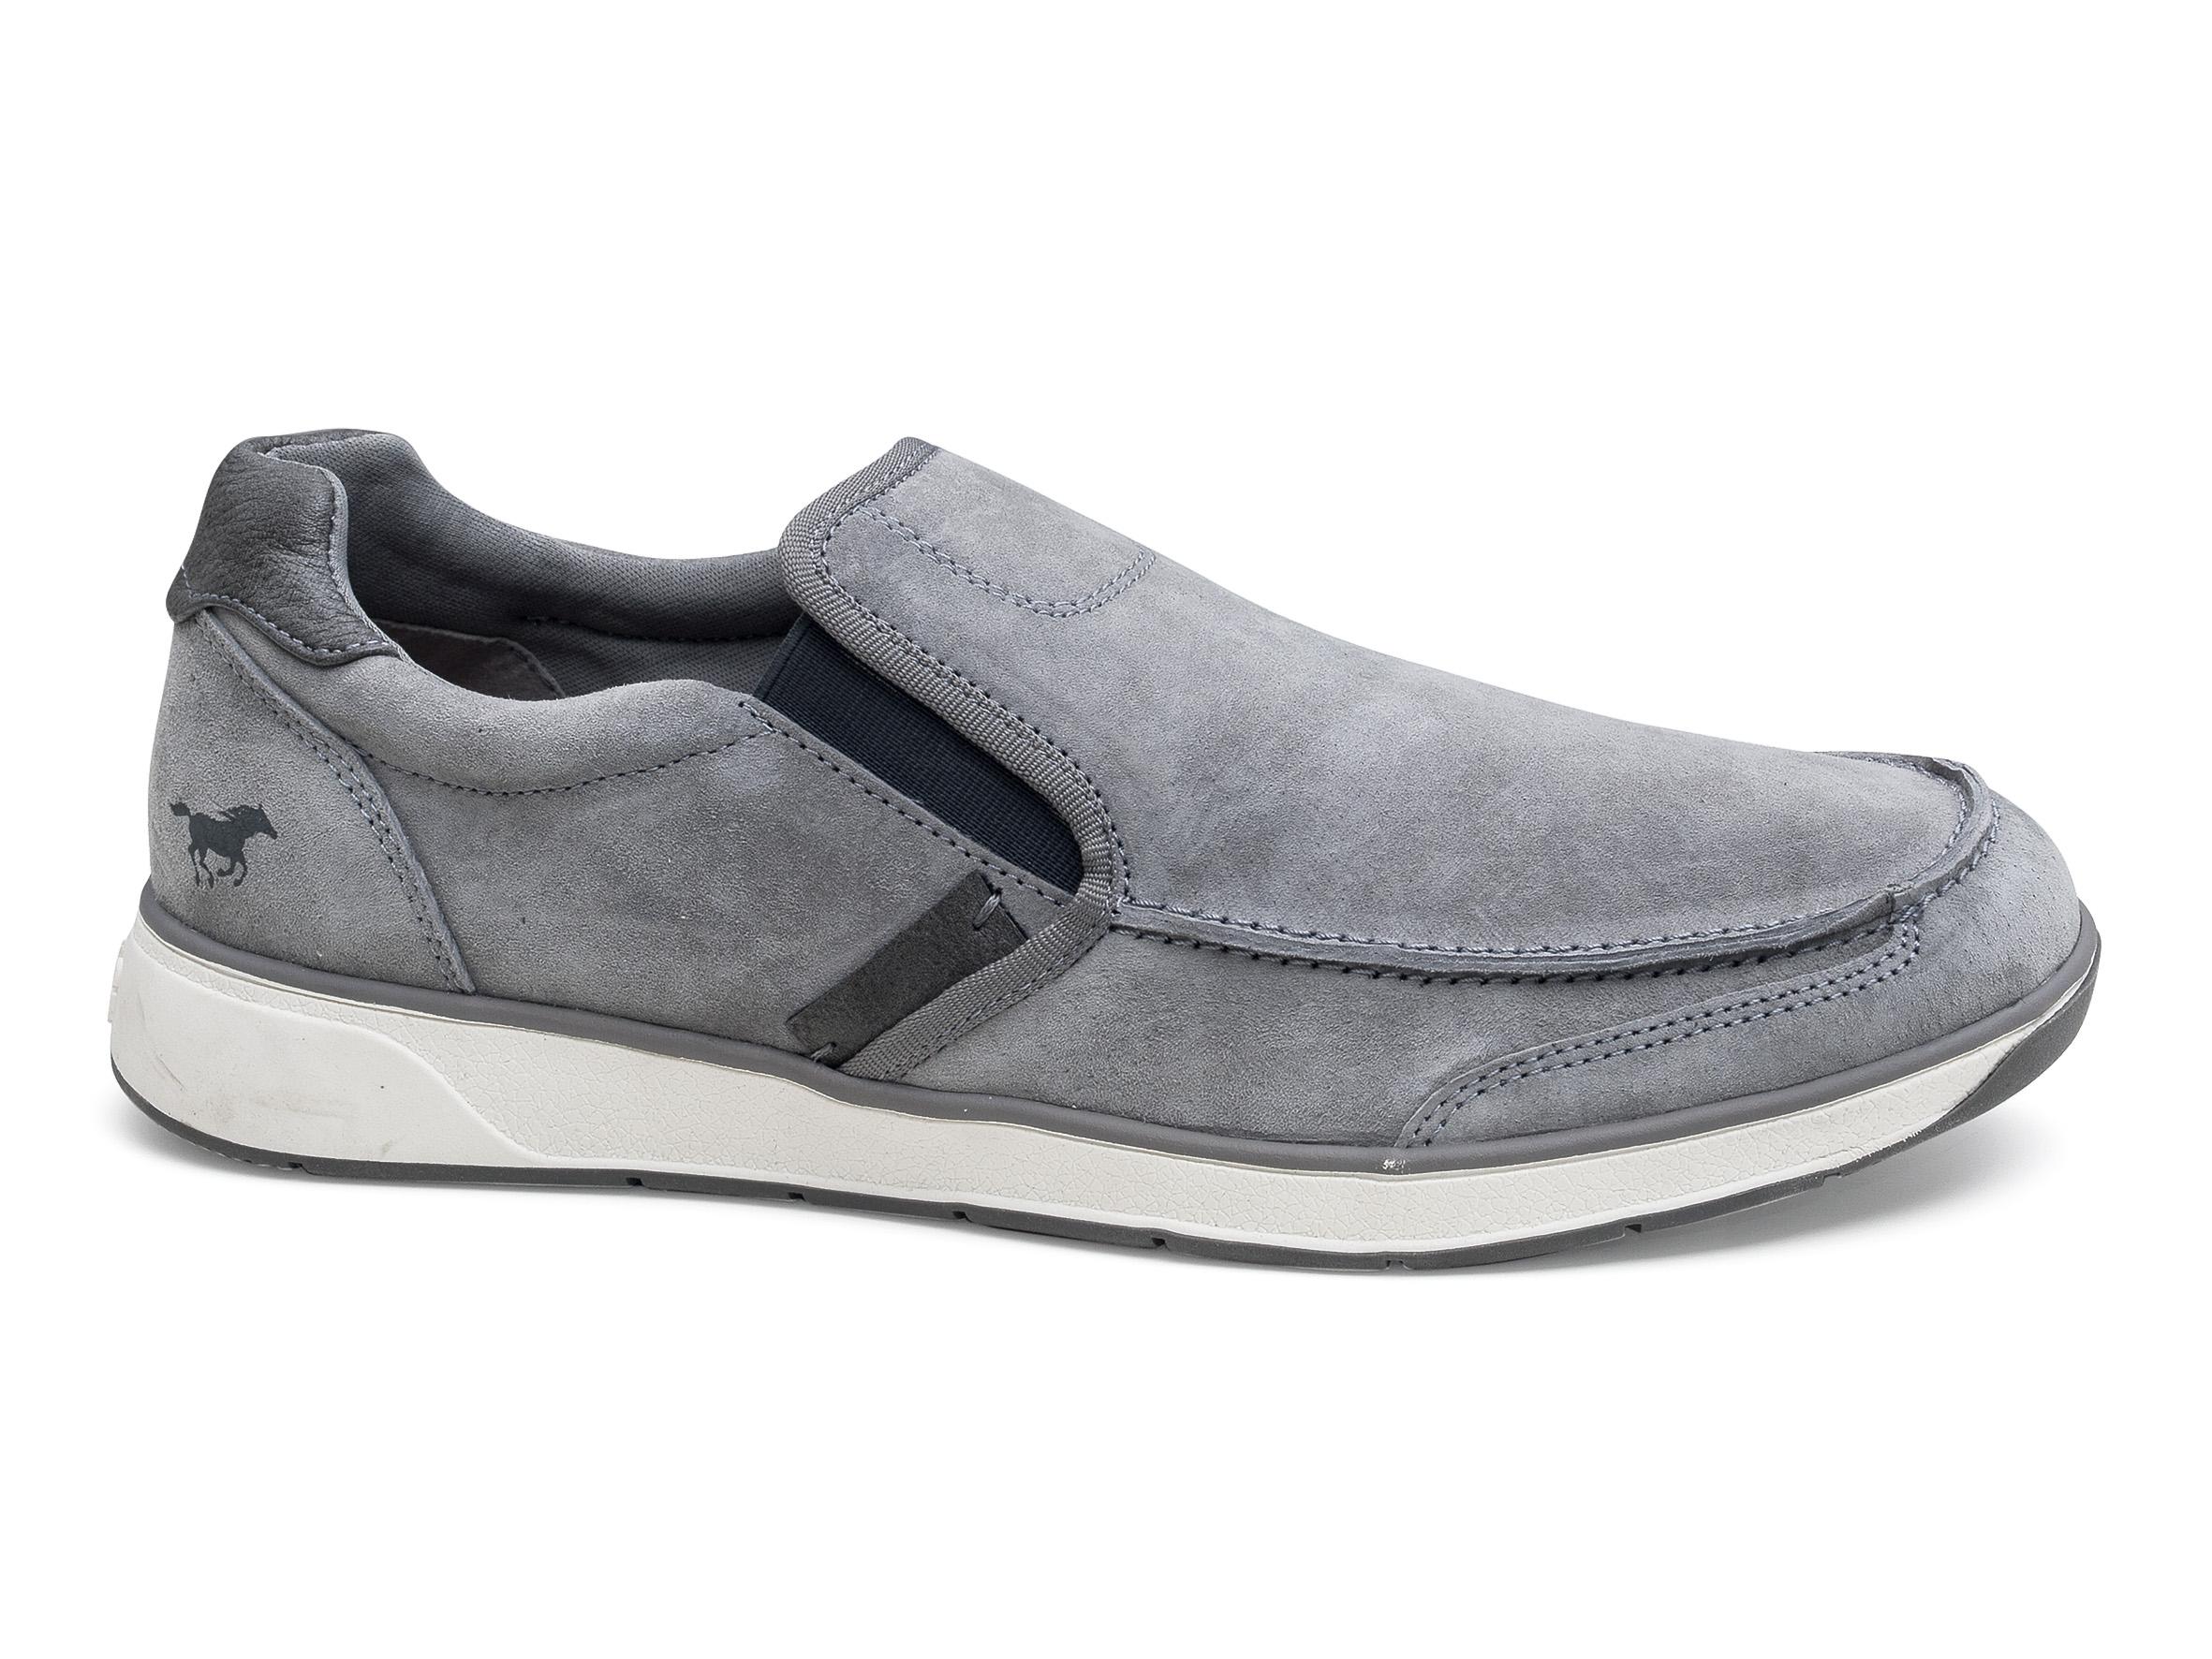 83a1b1f852917 Mustang boty shoes buty schuhe topánky chaussure cipő čevlje schoenen  scarpe zapatos batai pantofi sko skor ...